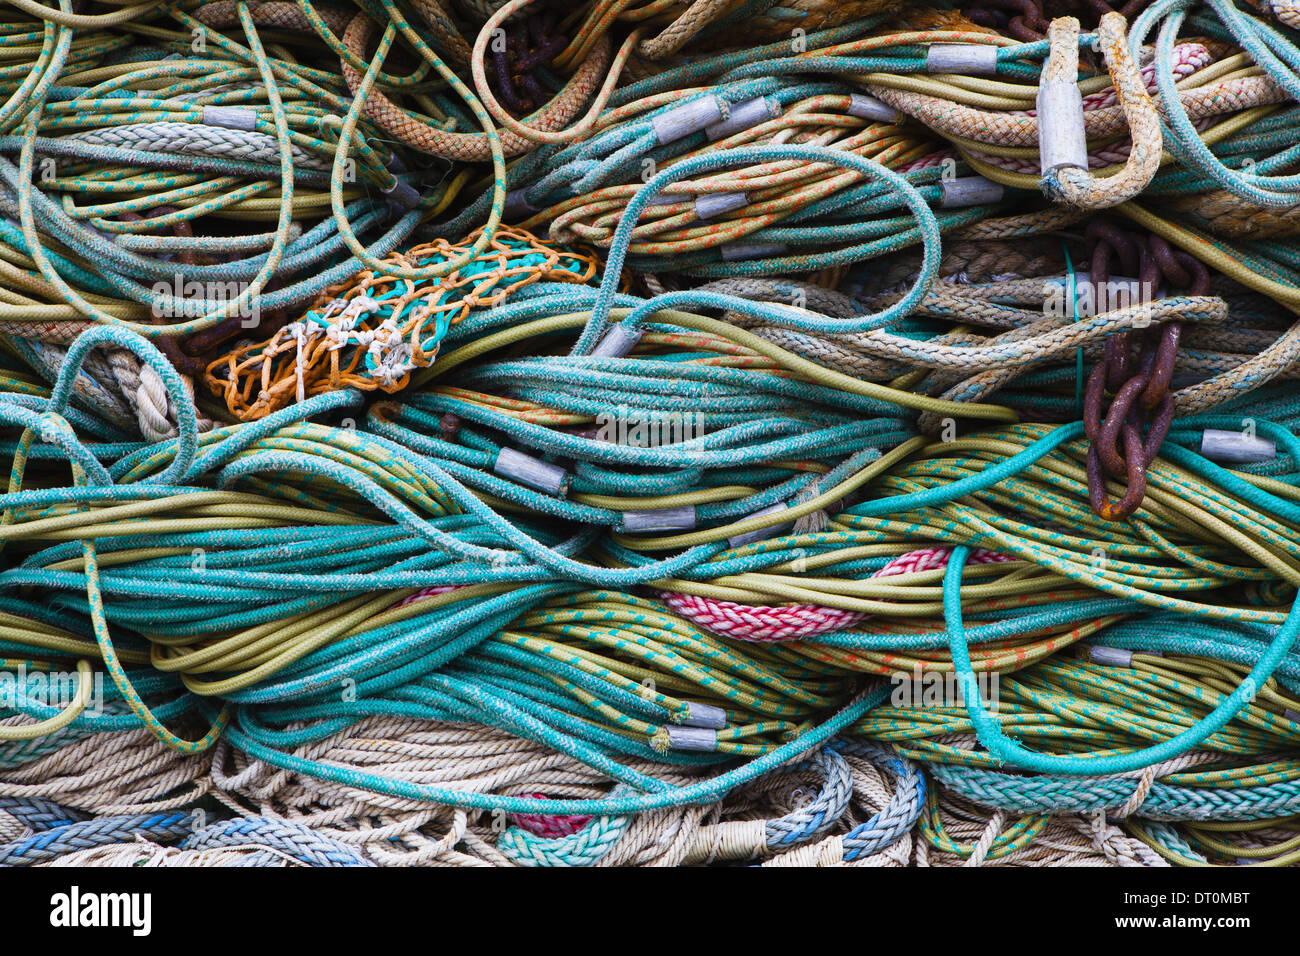 Seattle Washington USA Commercial fishing nets - Stock Image